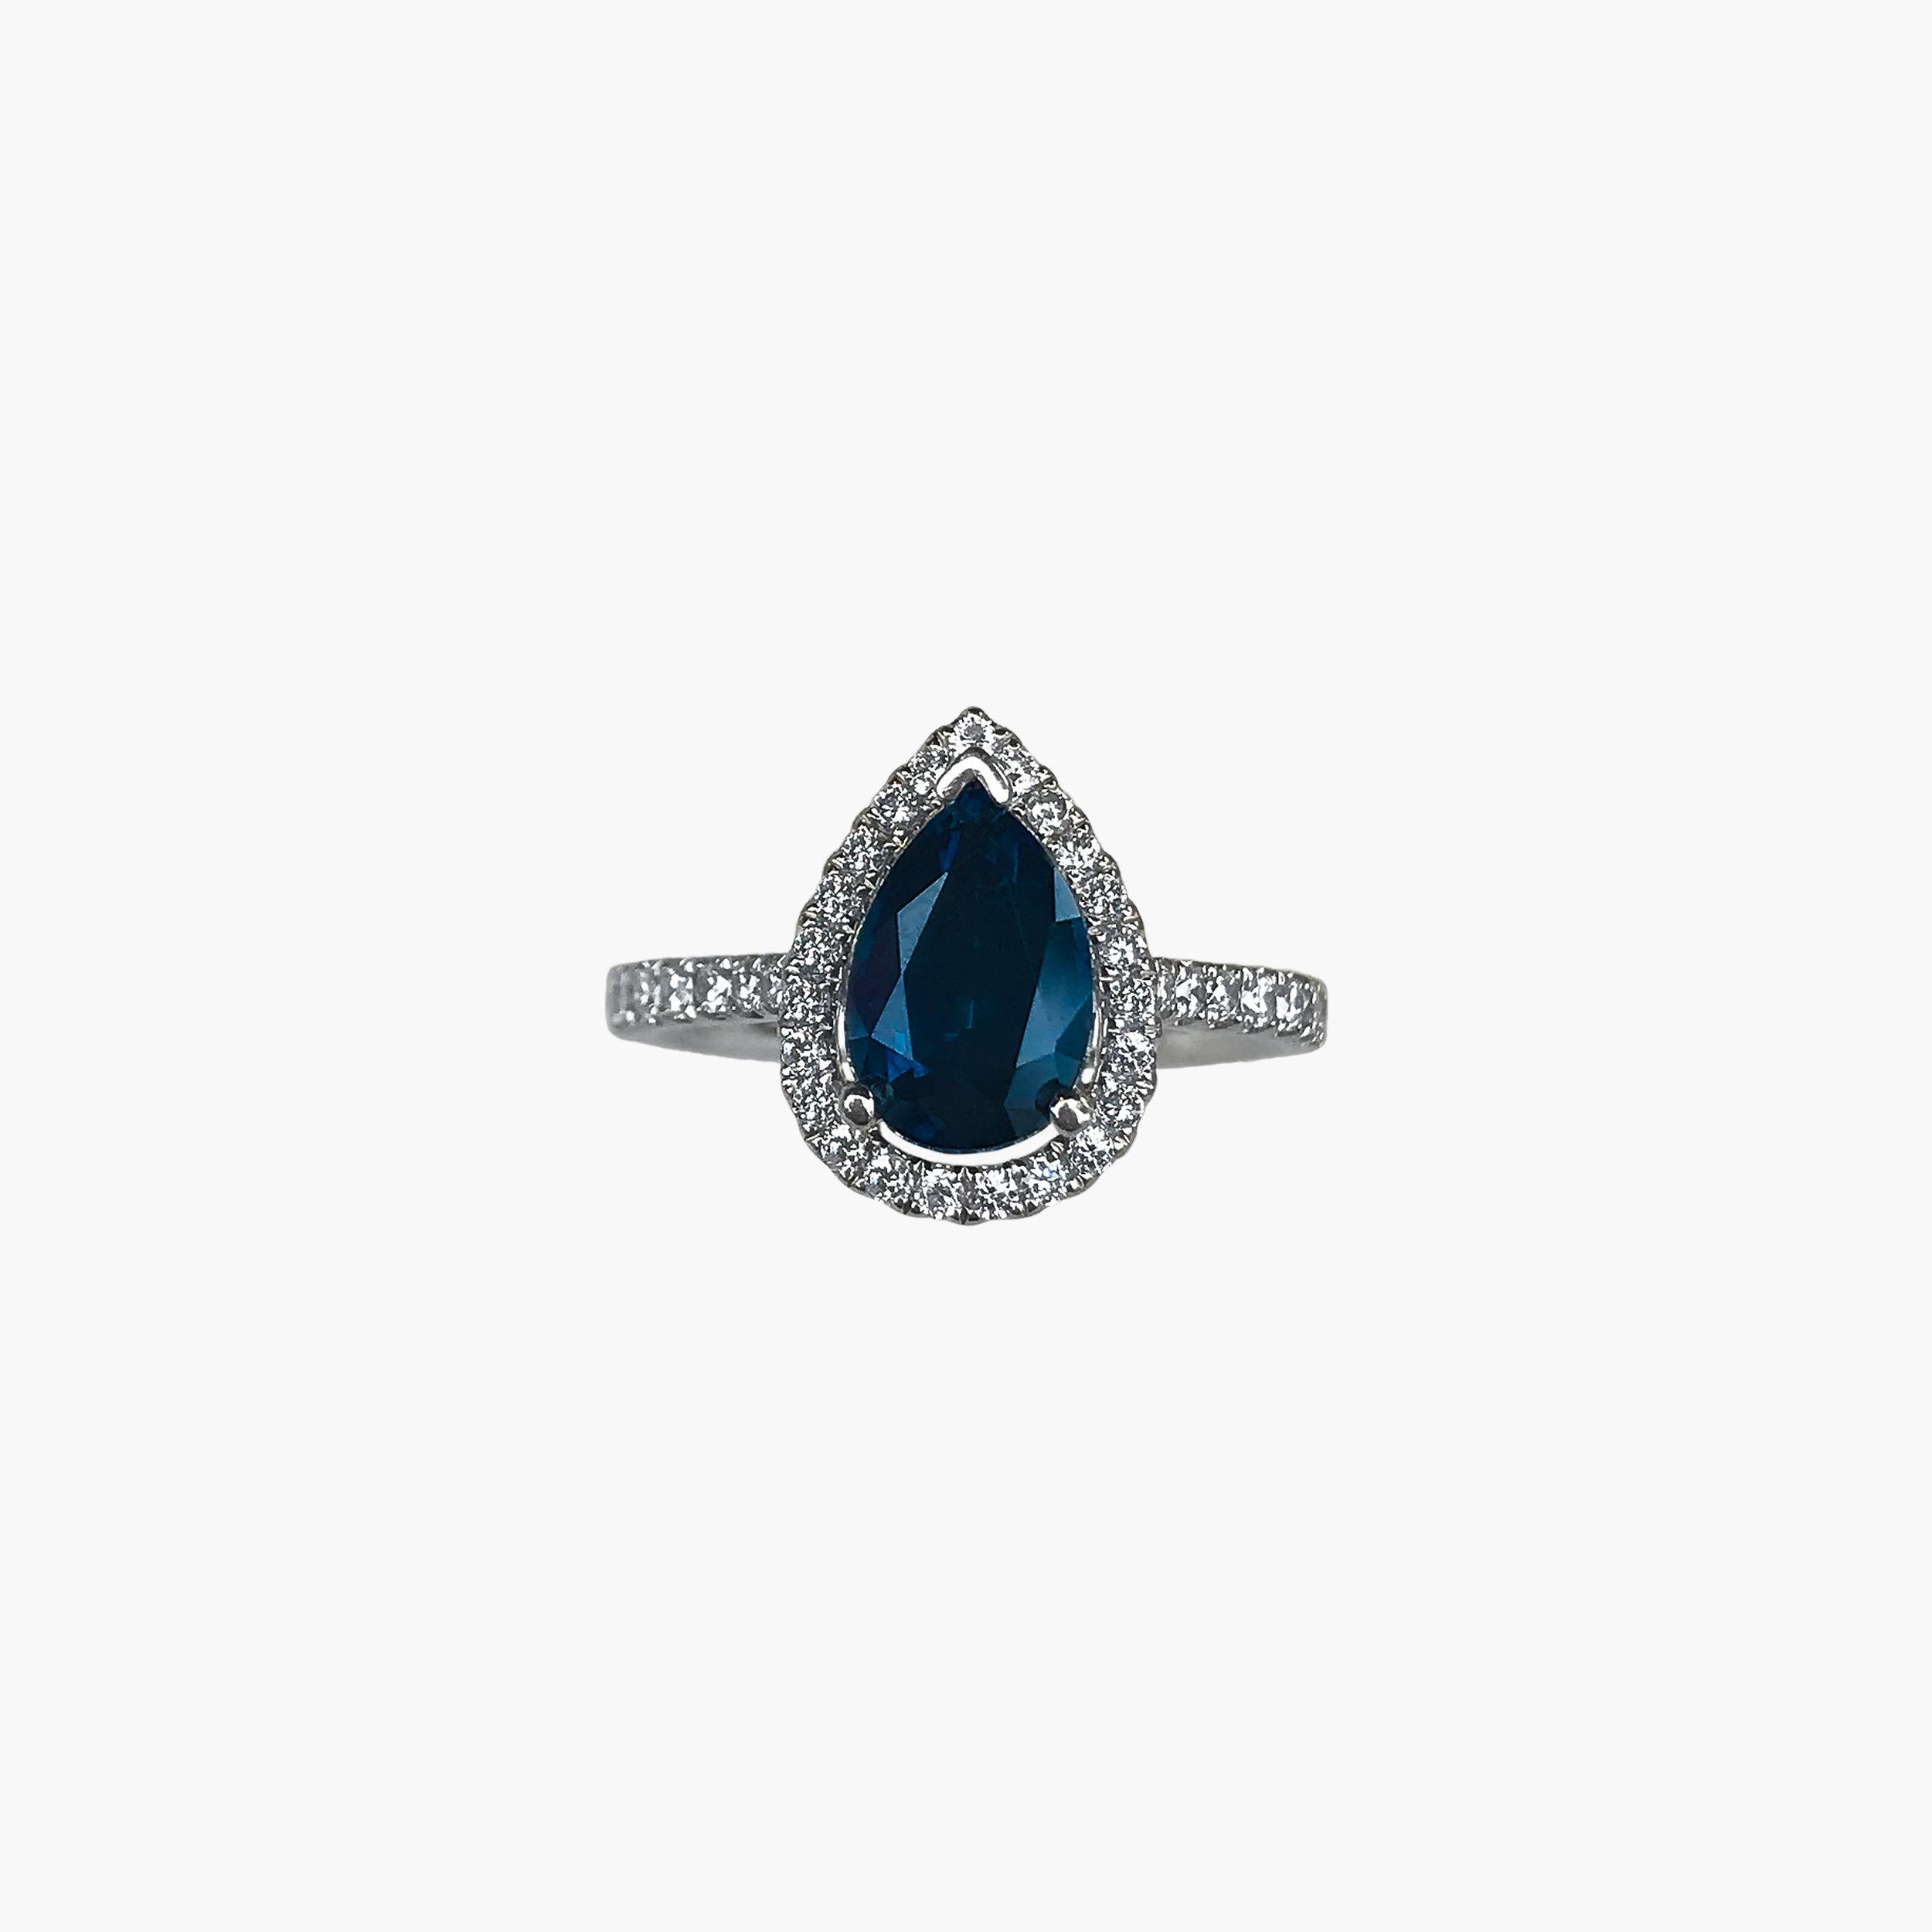 MONTANA SAPPHIRES — Stephen Isley Jewelry